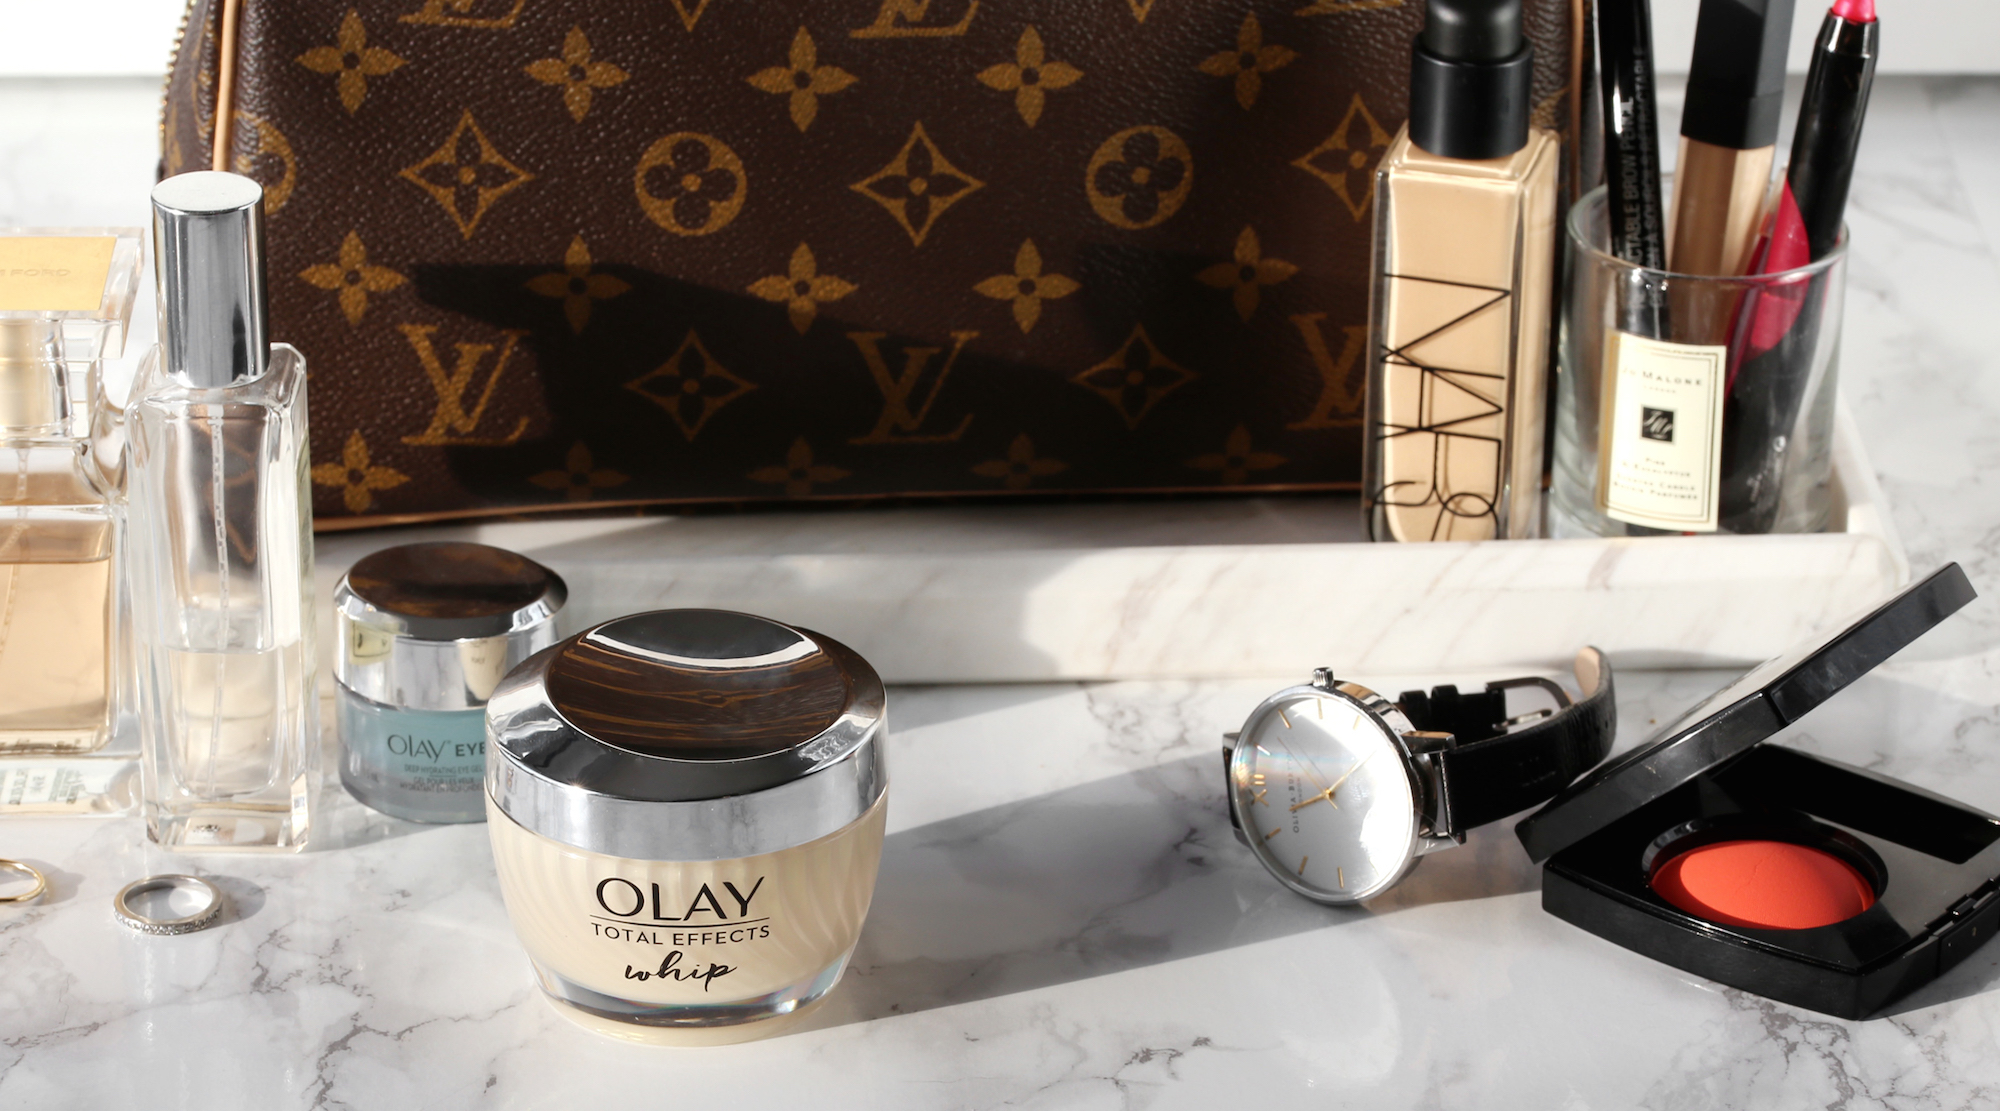 olay whips moisturizer review - woahstyle.com - beauty blog by nathalie martin_6710.jpg